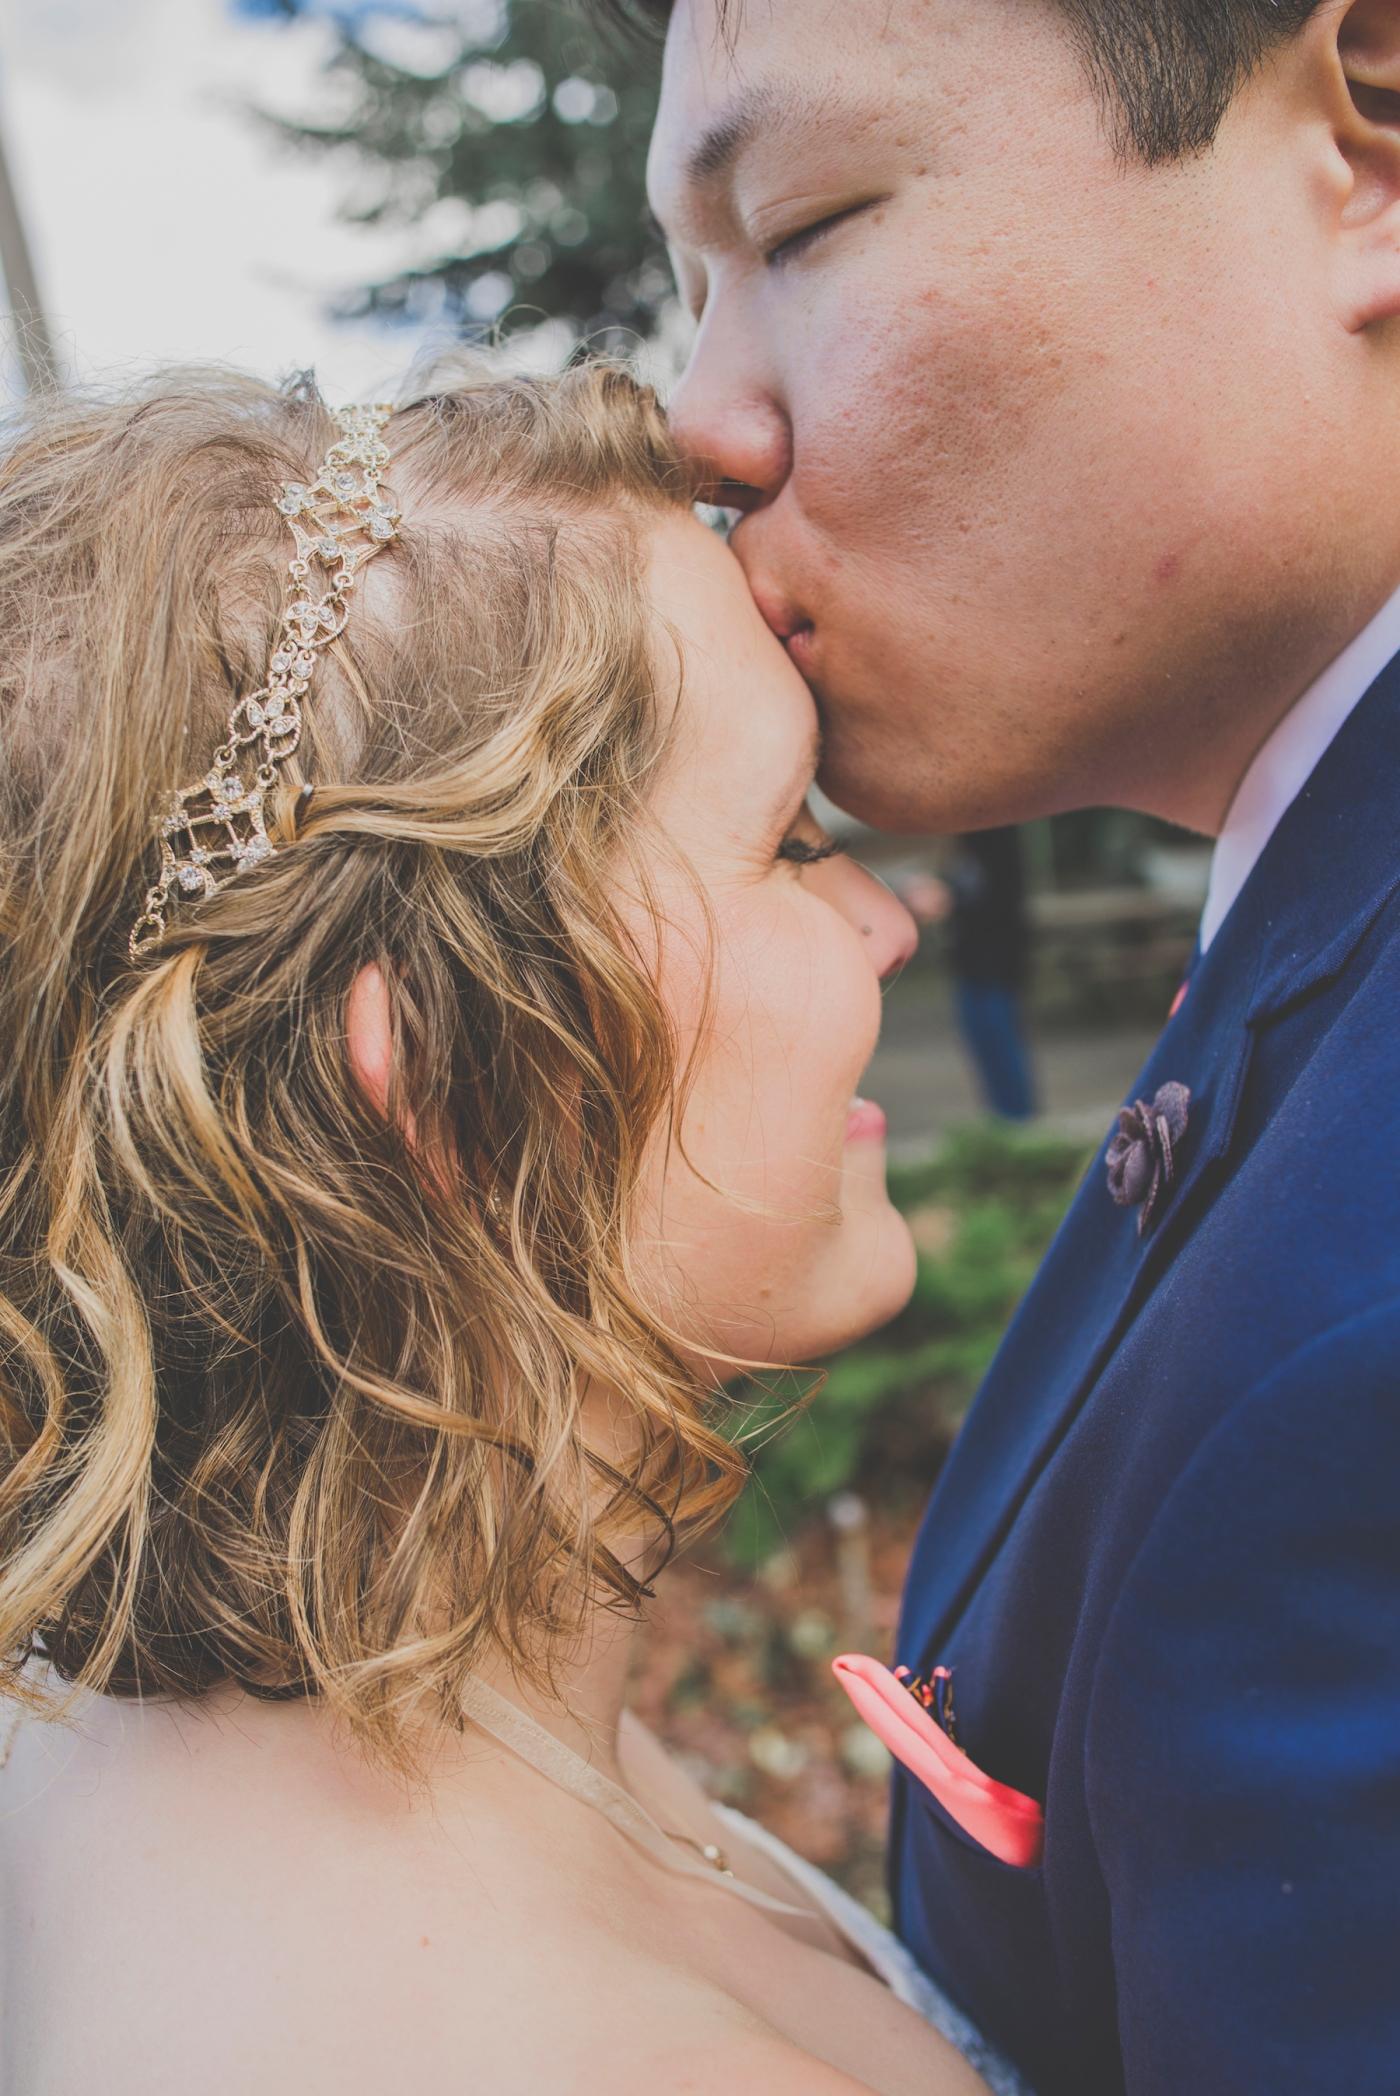 DSC_2347Everett_Wedding_Ballroom_Jane_Speleers_photography_Rachel_and_Edmund_Bridesmaids_peach_dresses_groomsmen_2017